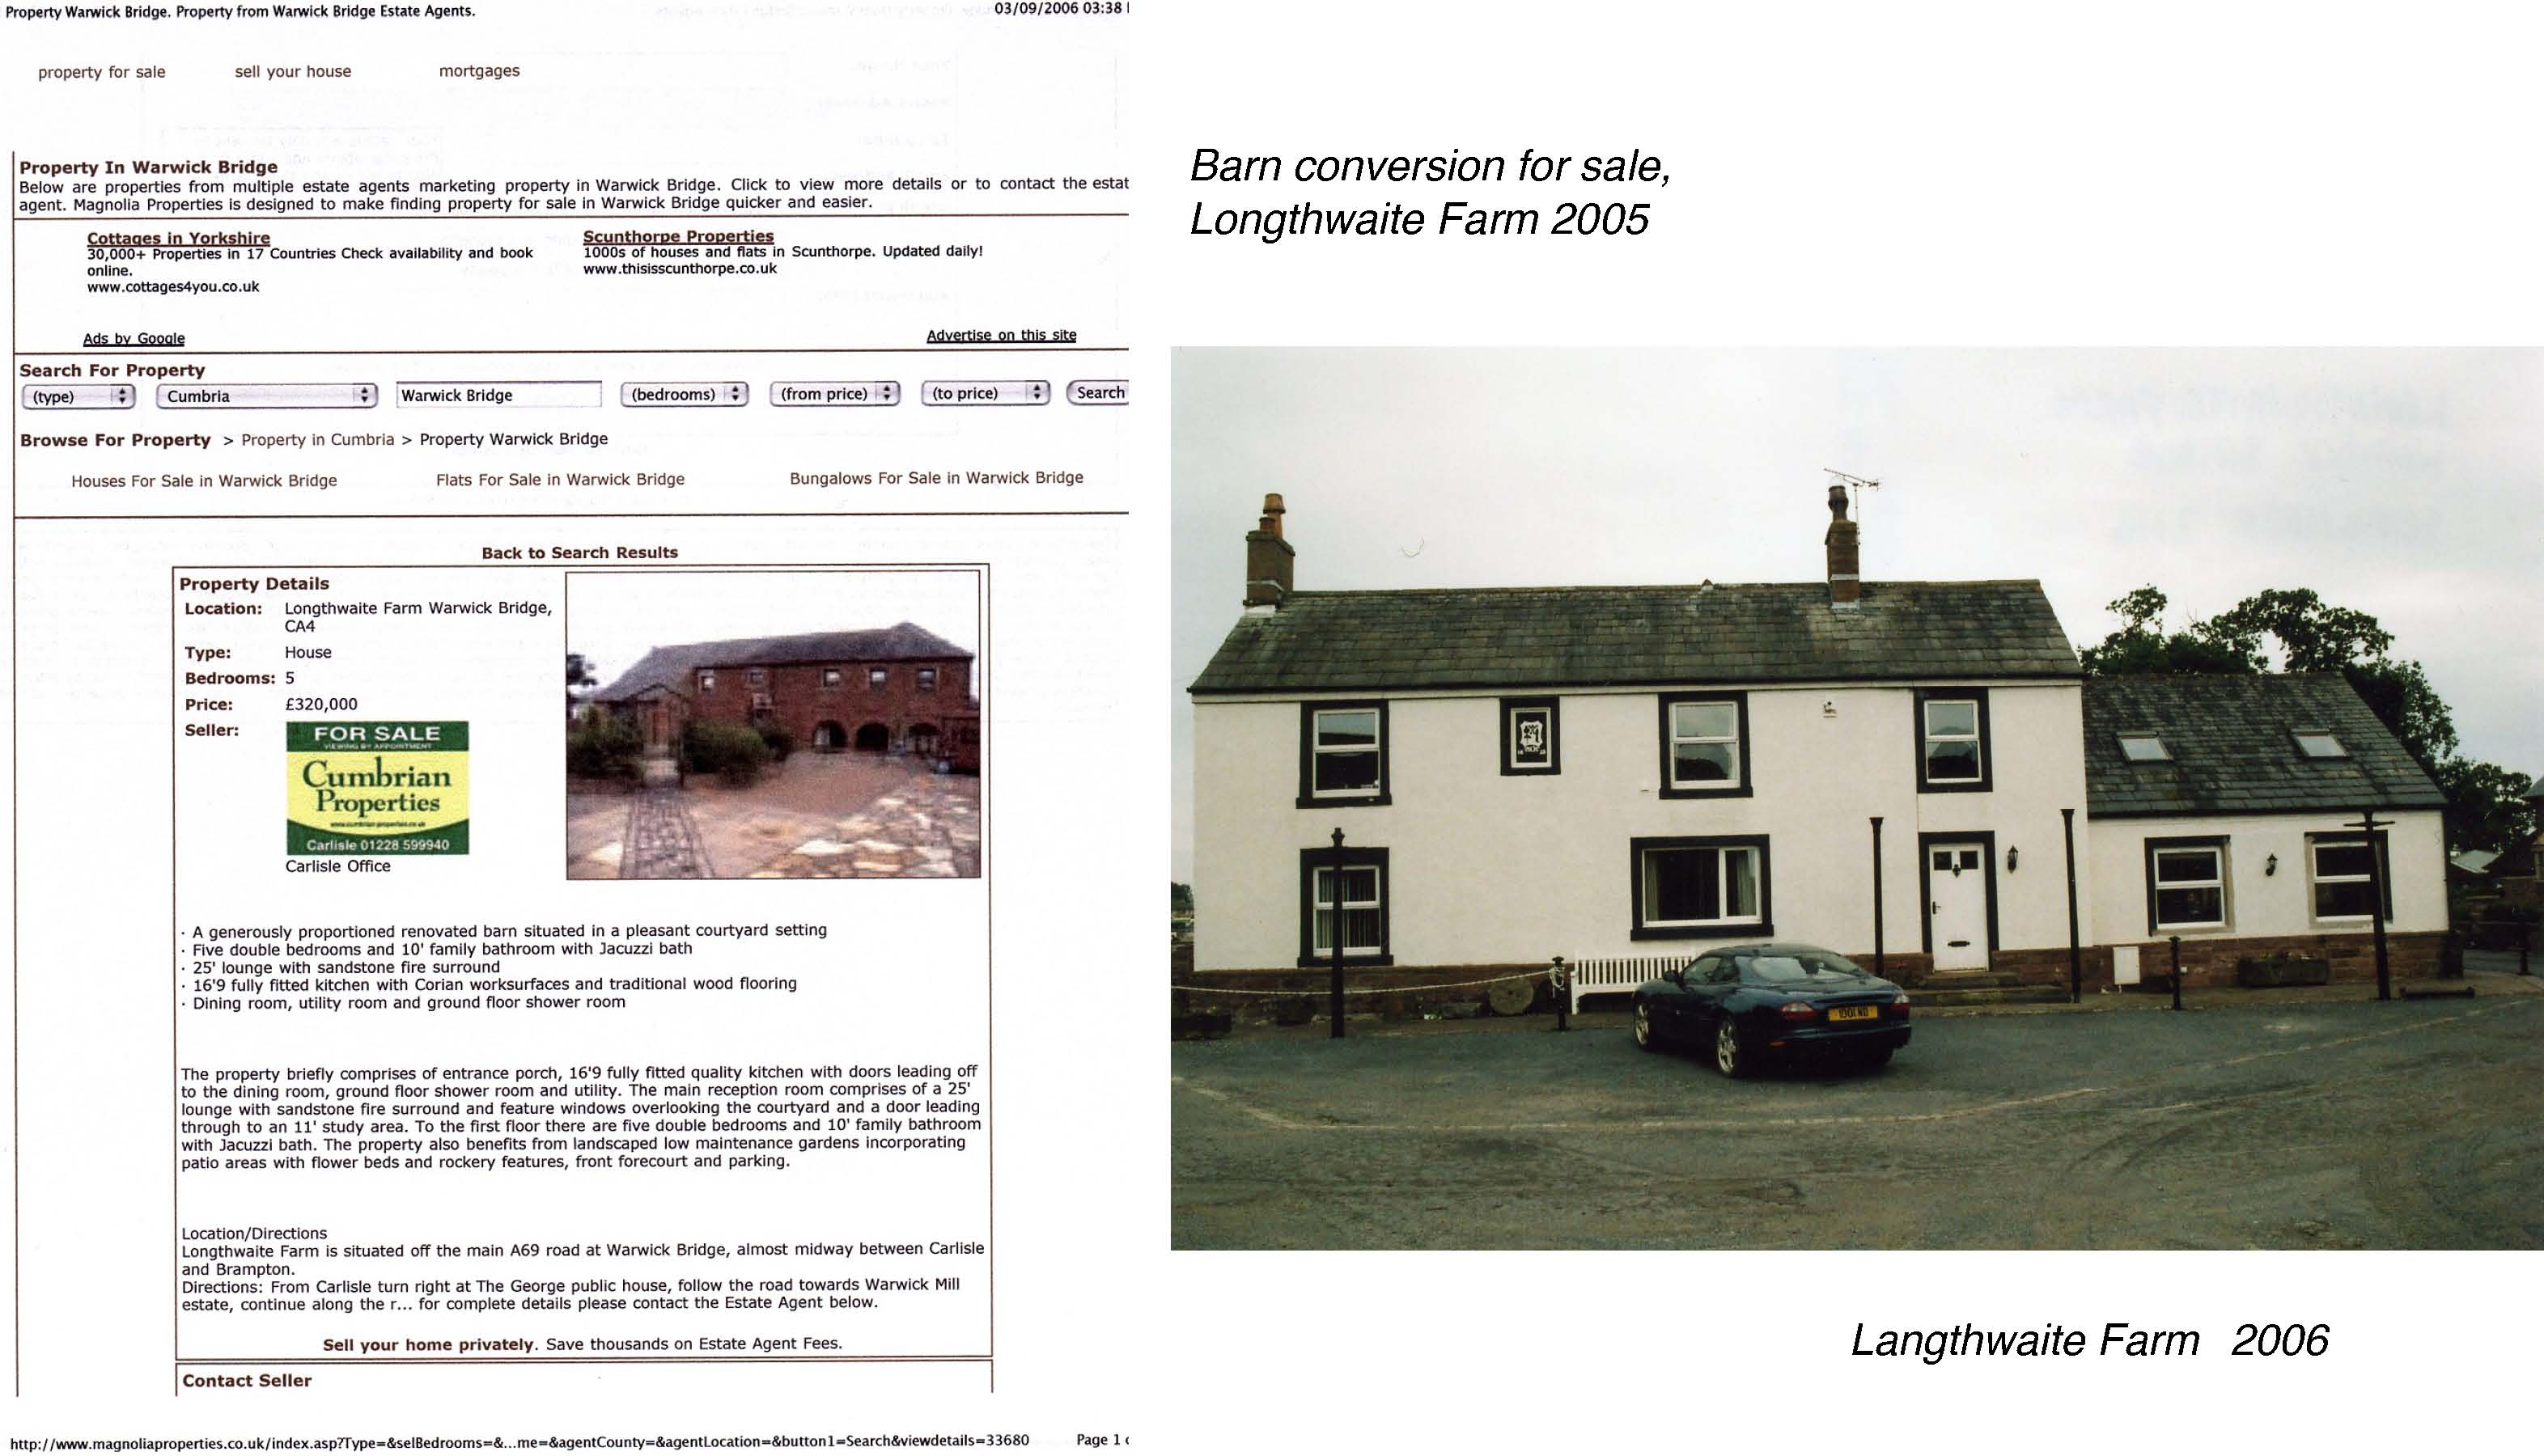 Langthwaite Farm 2006